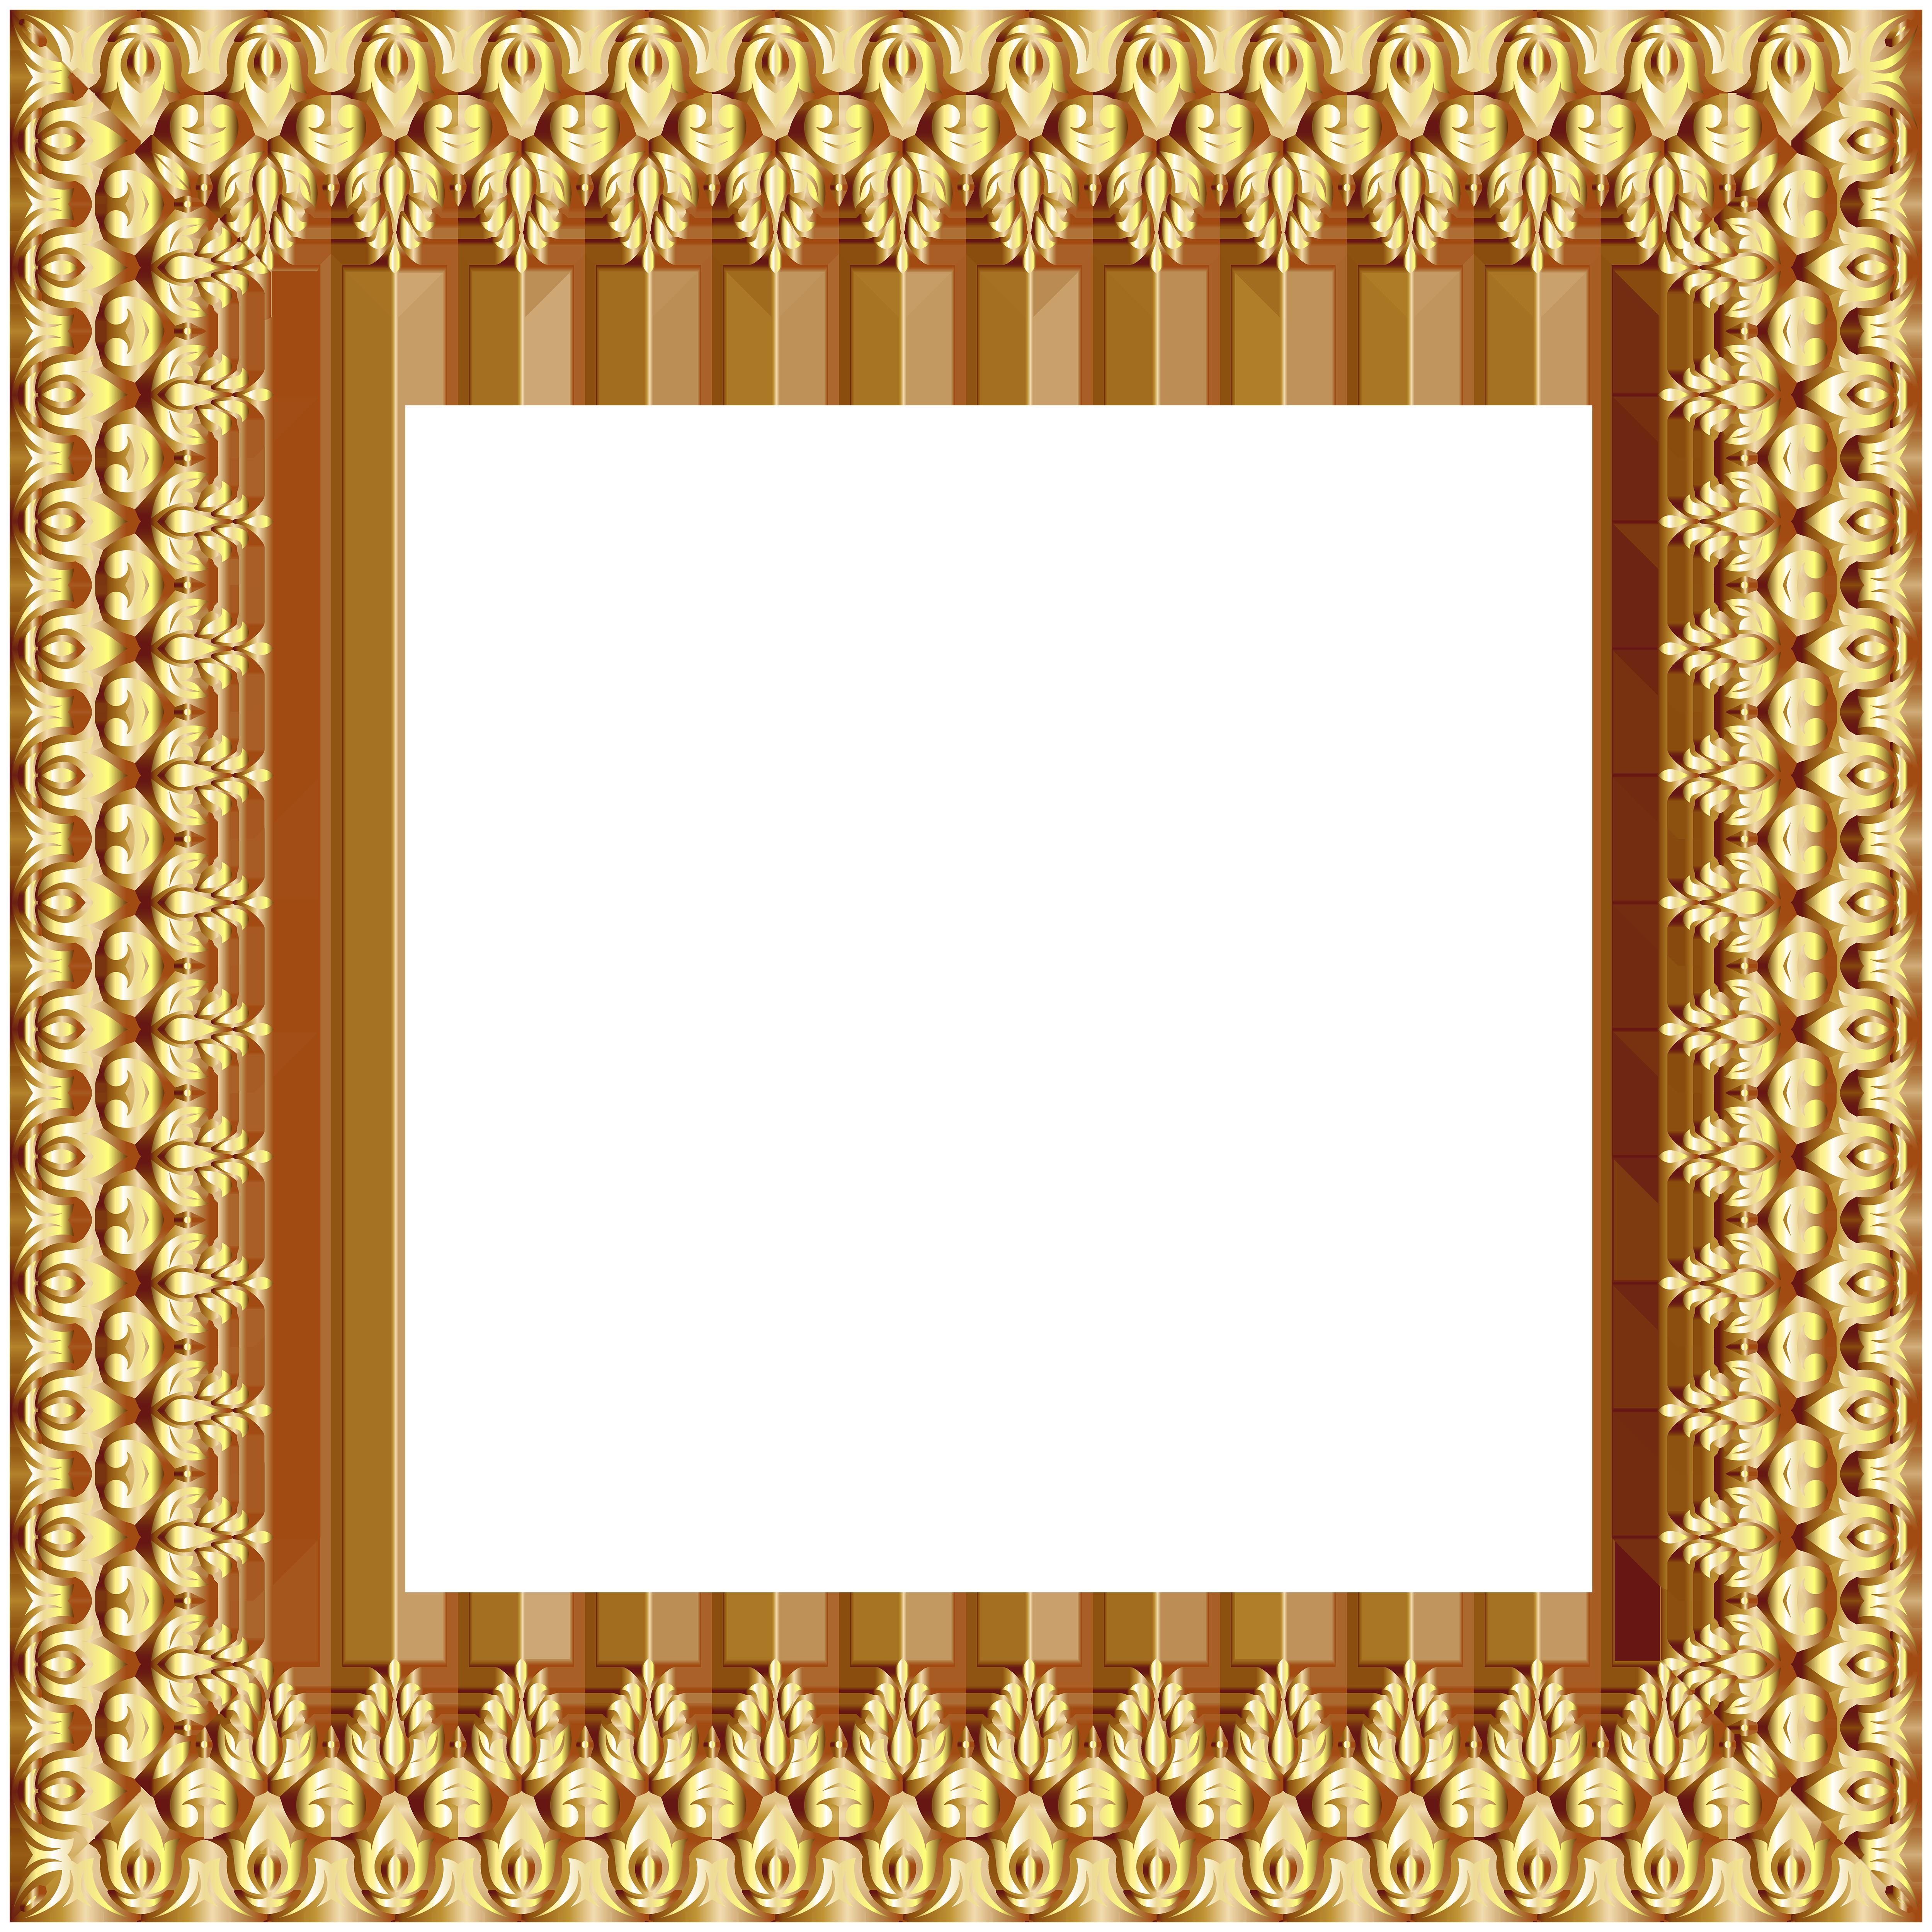 Frame transparent png clip. Clipart gallery border